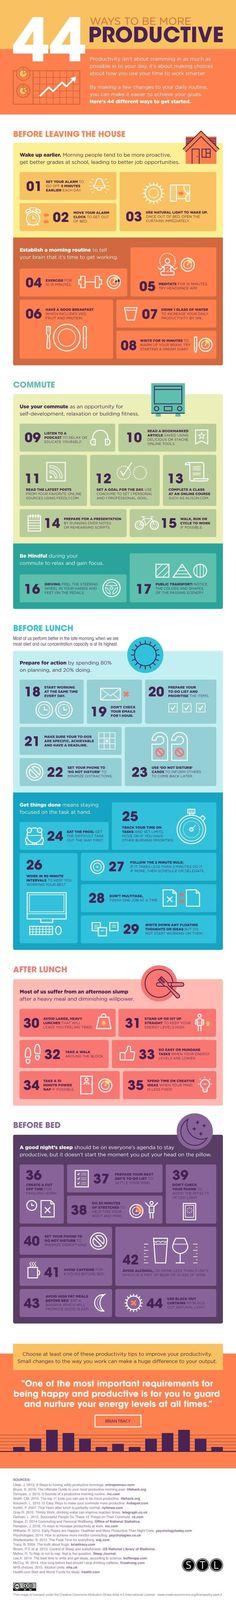 44-Ways-to-Be-a-More-Productive-Entrepreneur-1.jpg 720×4.895 pixeli